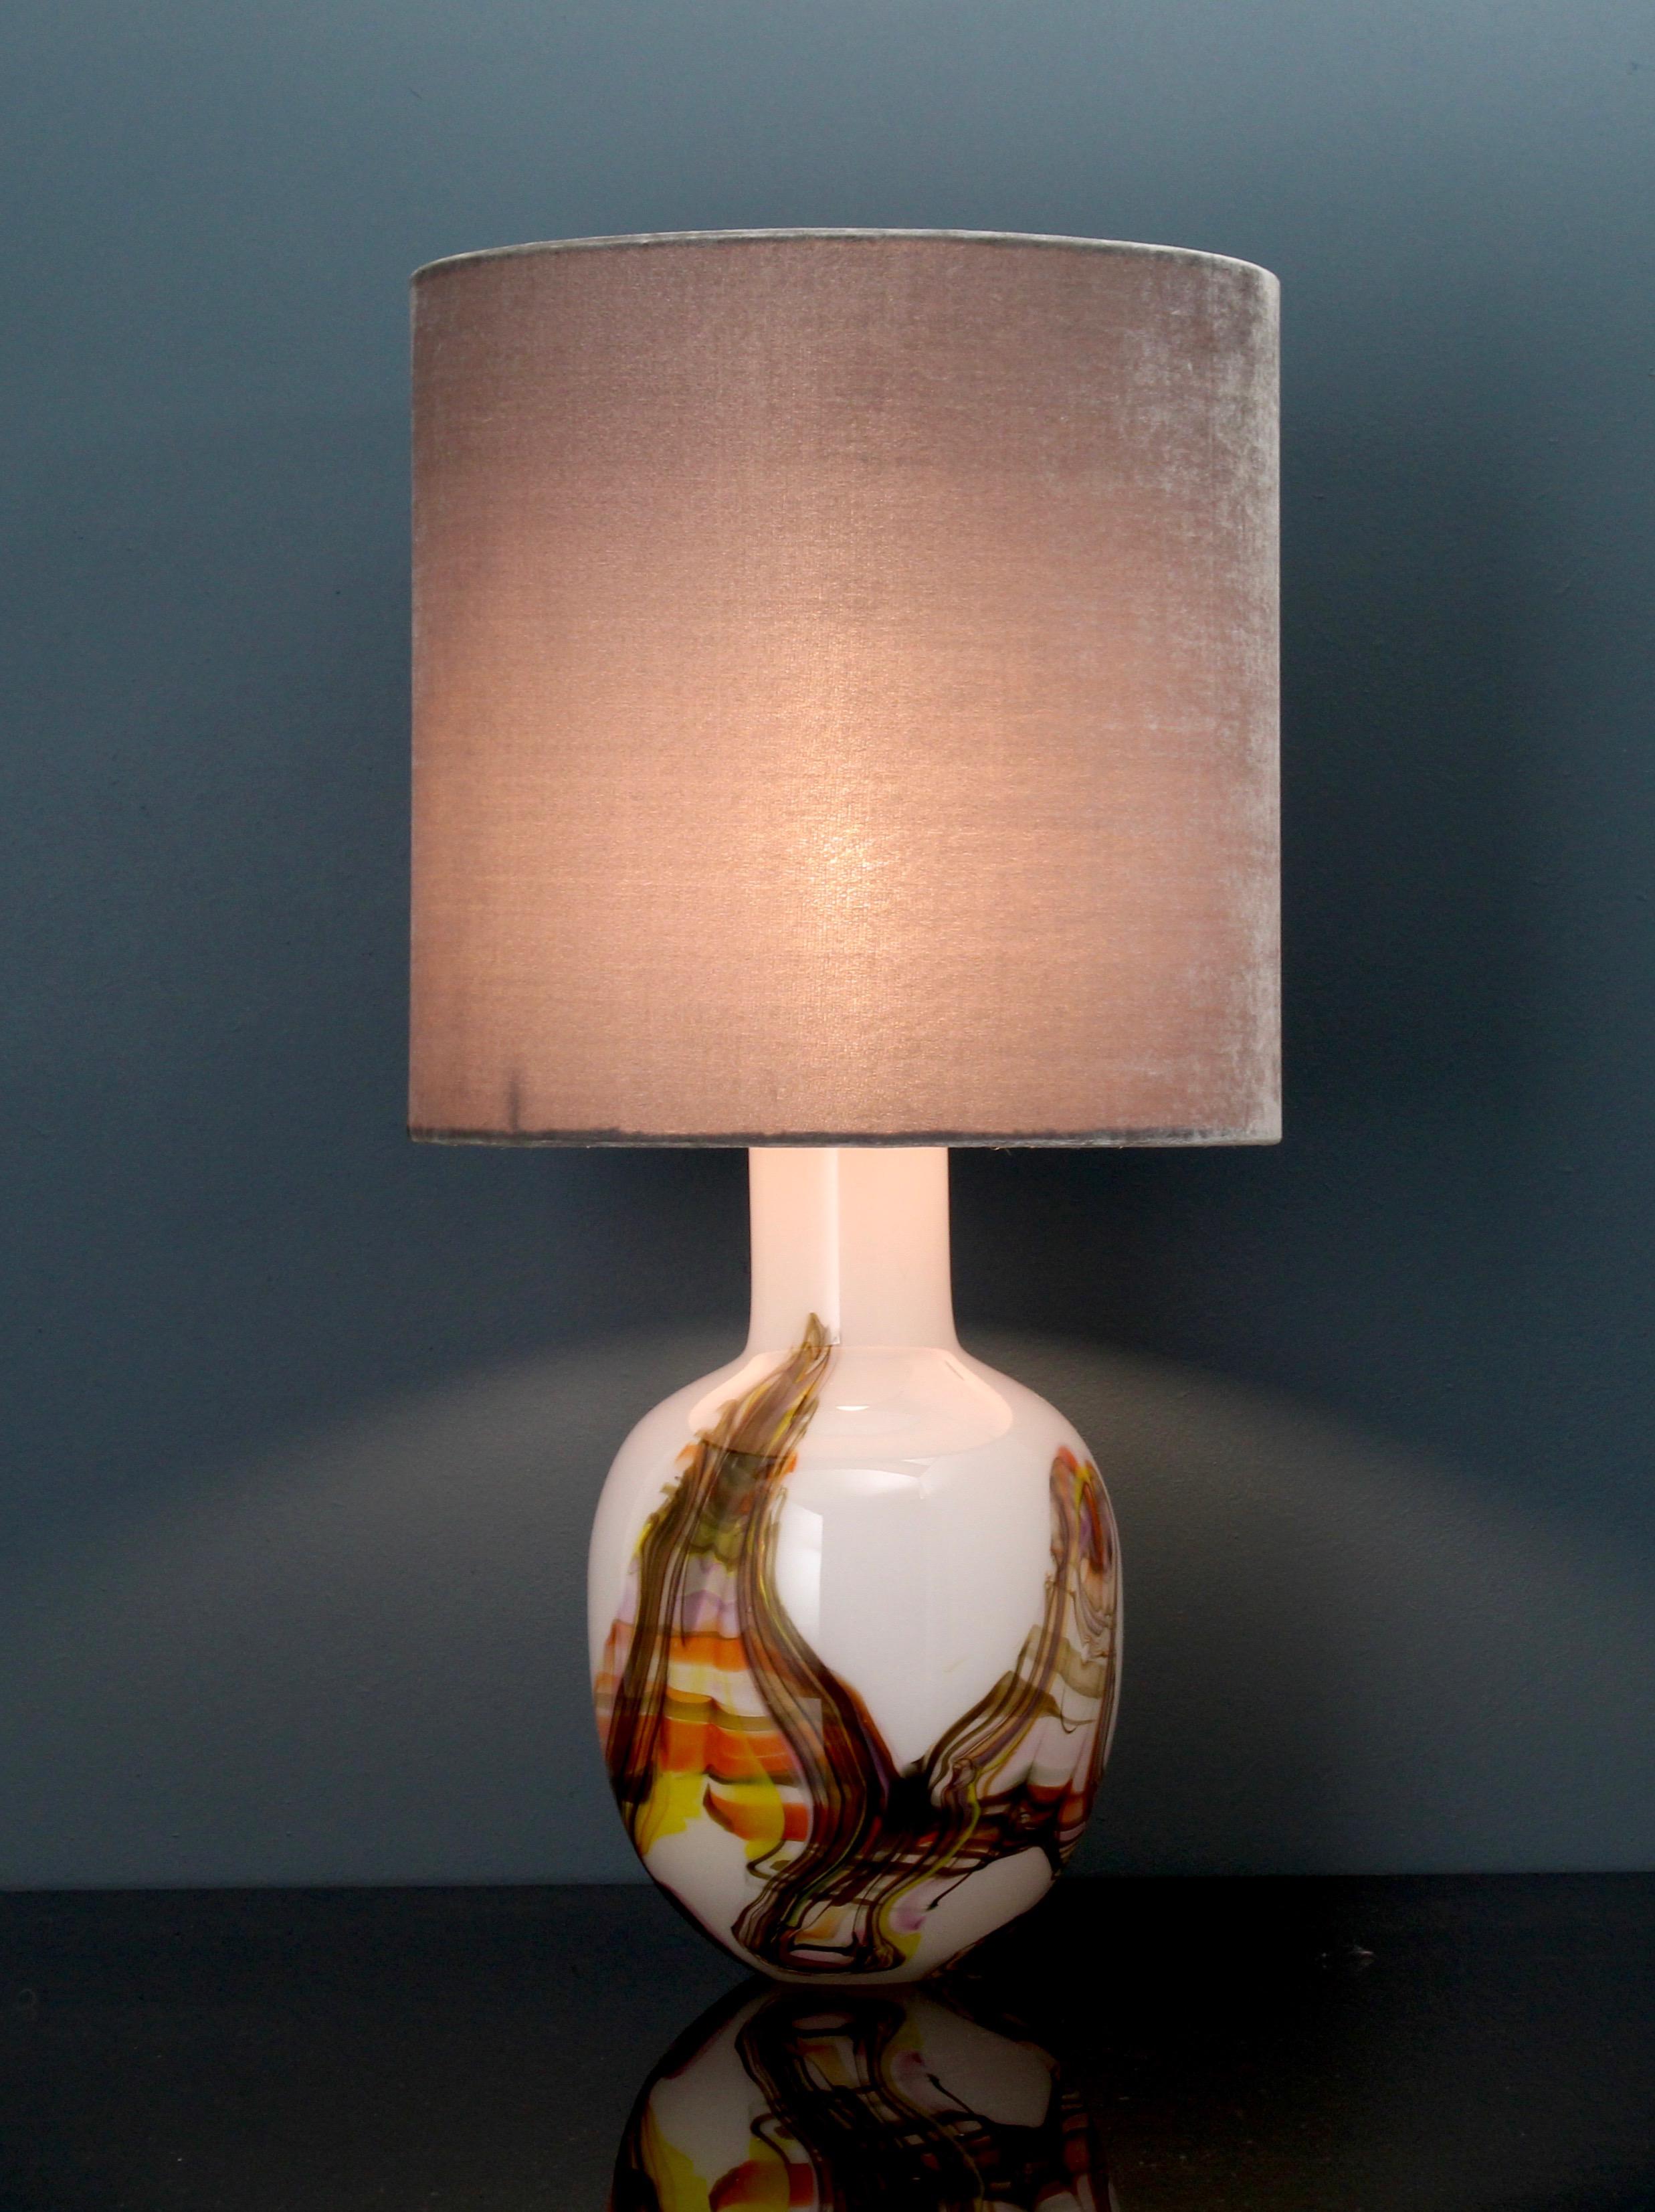 Glass art table lamp, handblown white/orangebrown